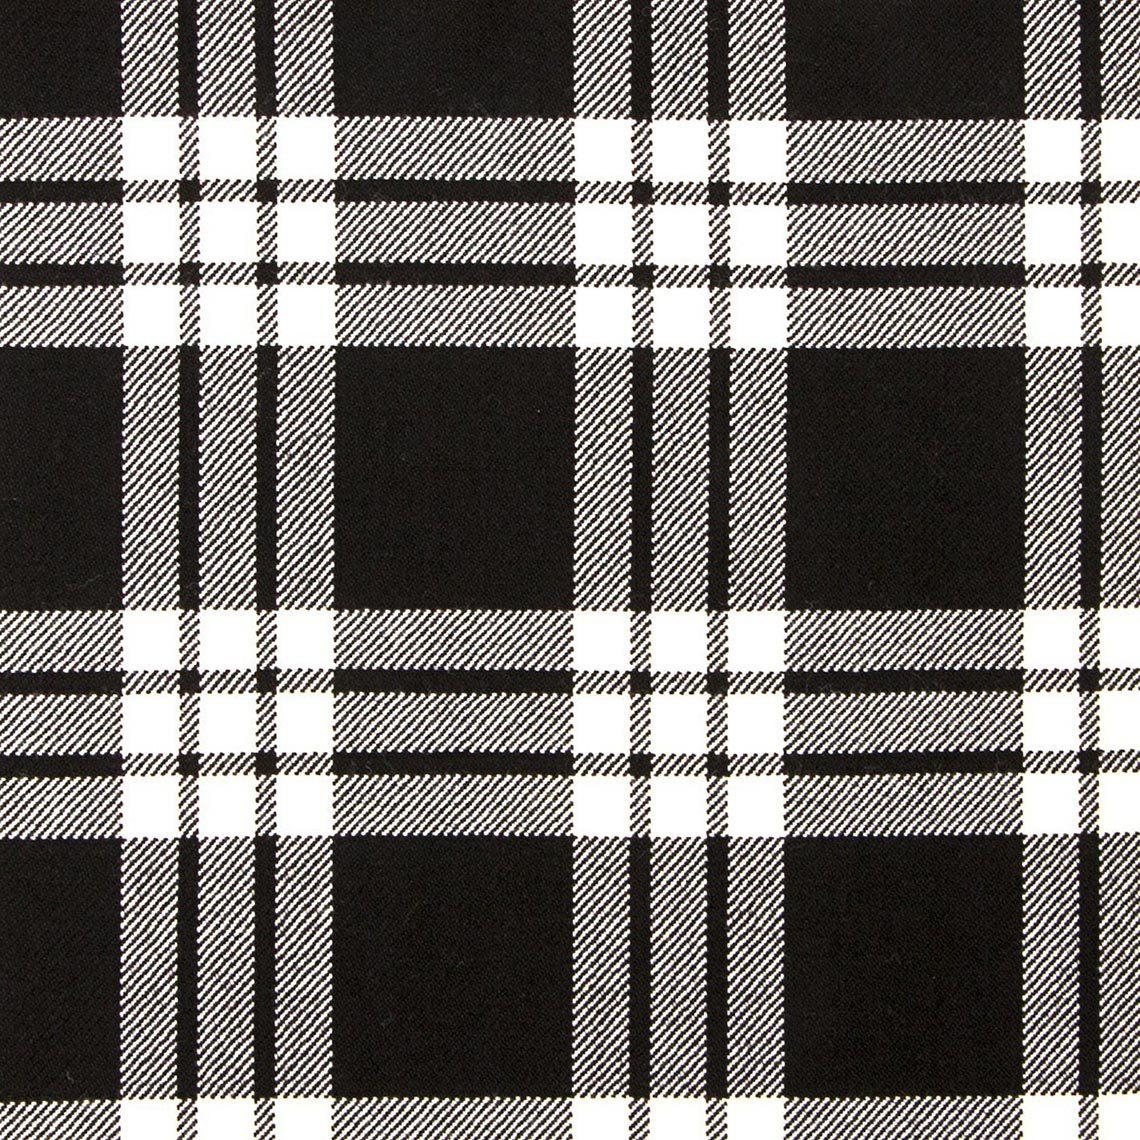 MacFarlane (Black & White) Kilt